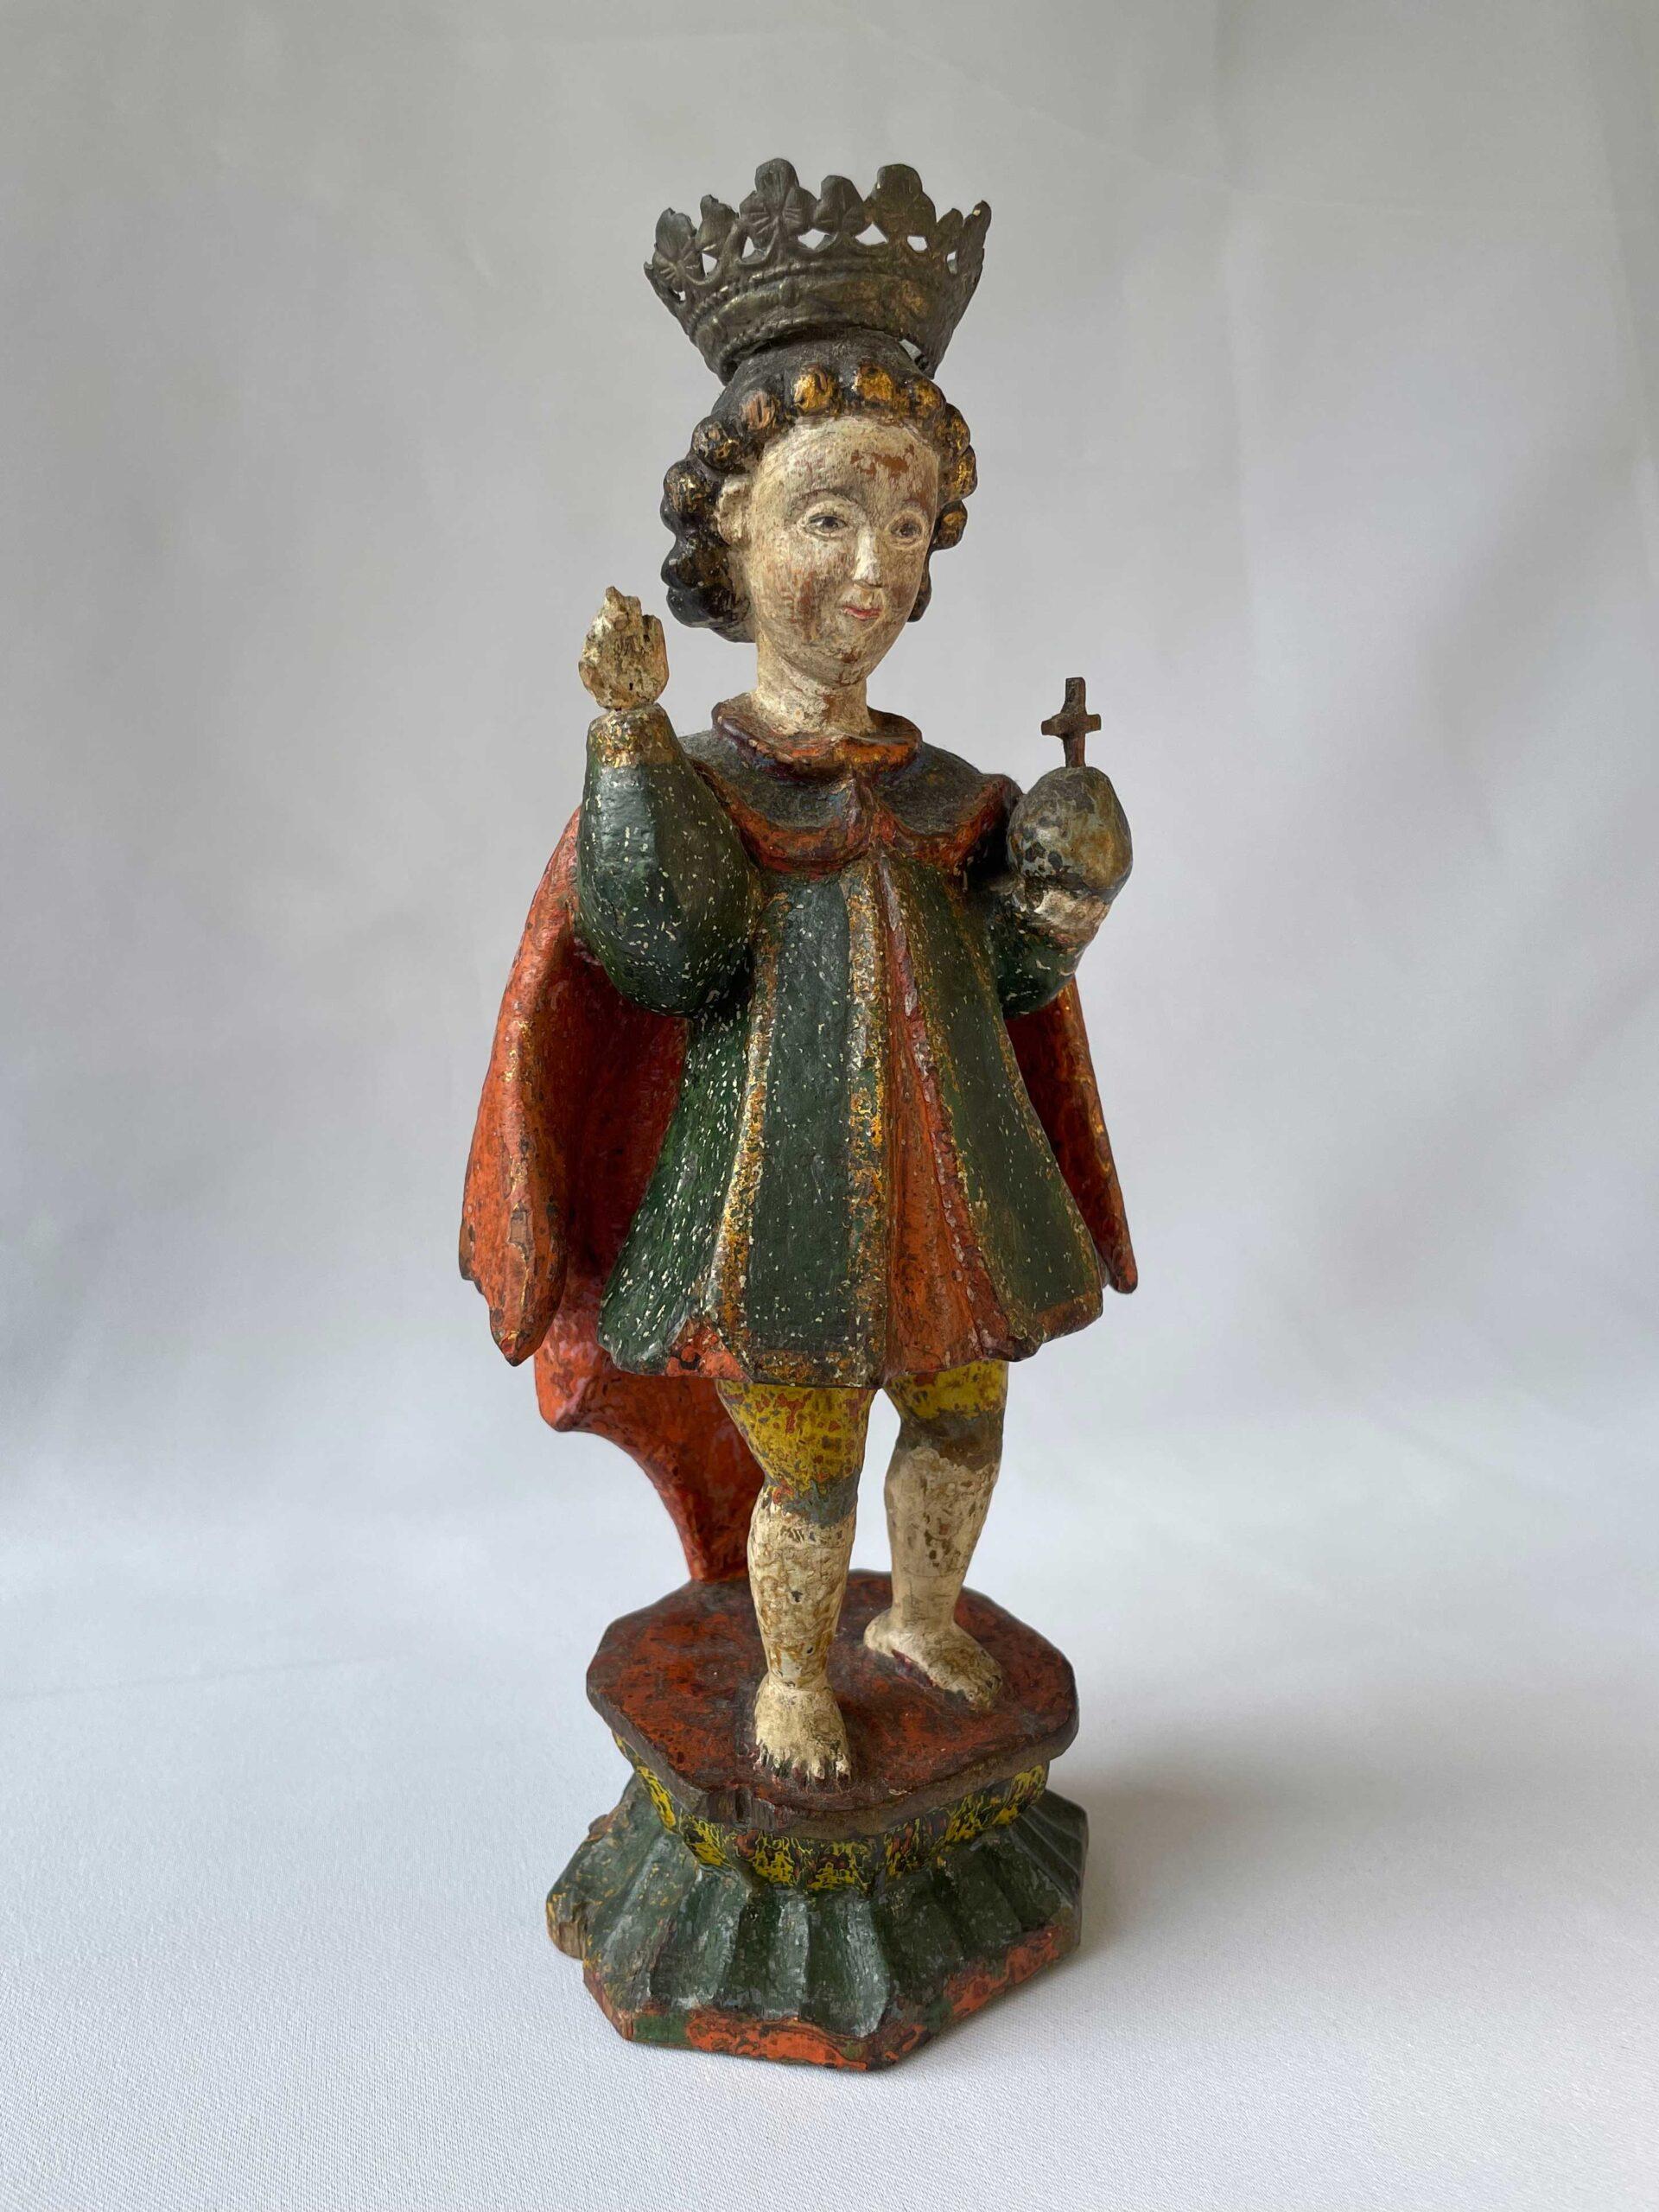 Santo Niño de Cebu (Holy Child of Cebu), Cebu (18th Century)